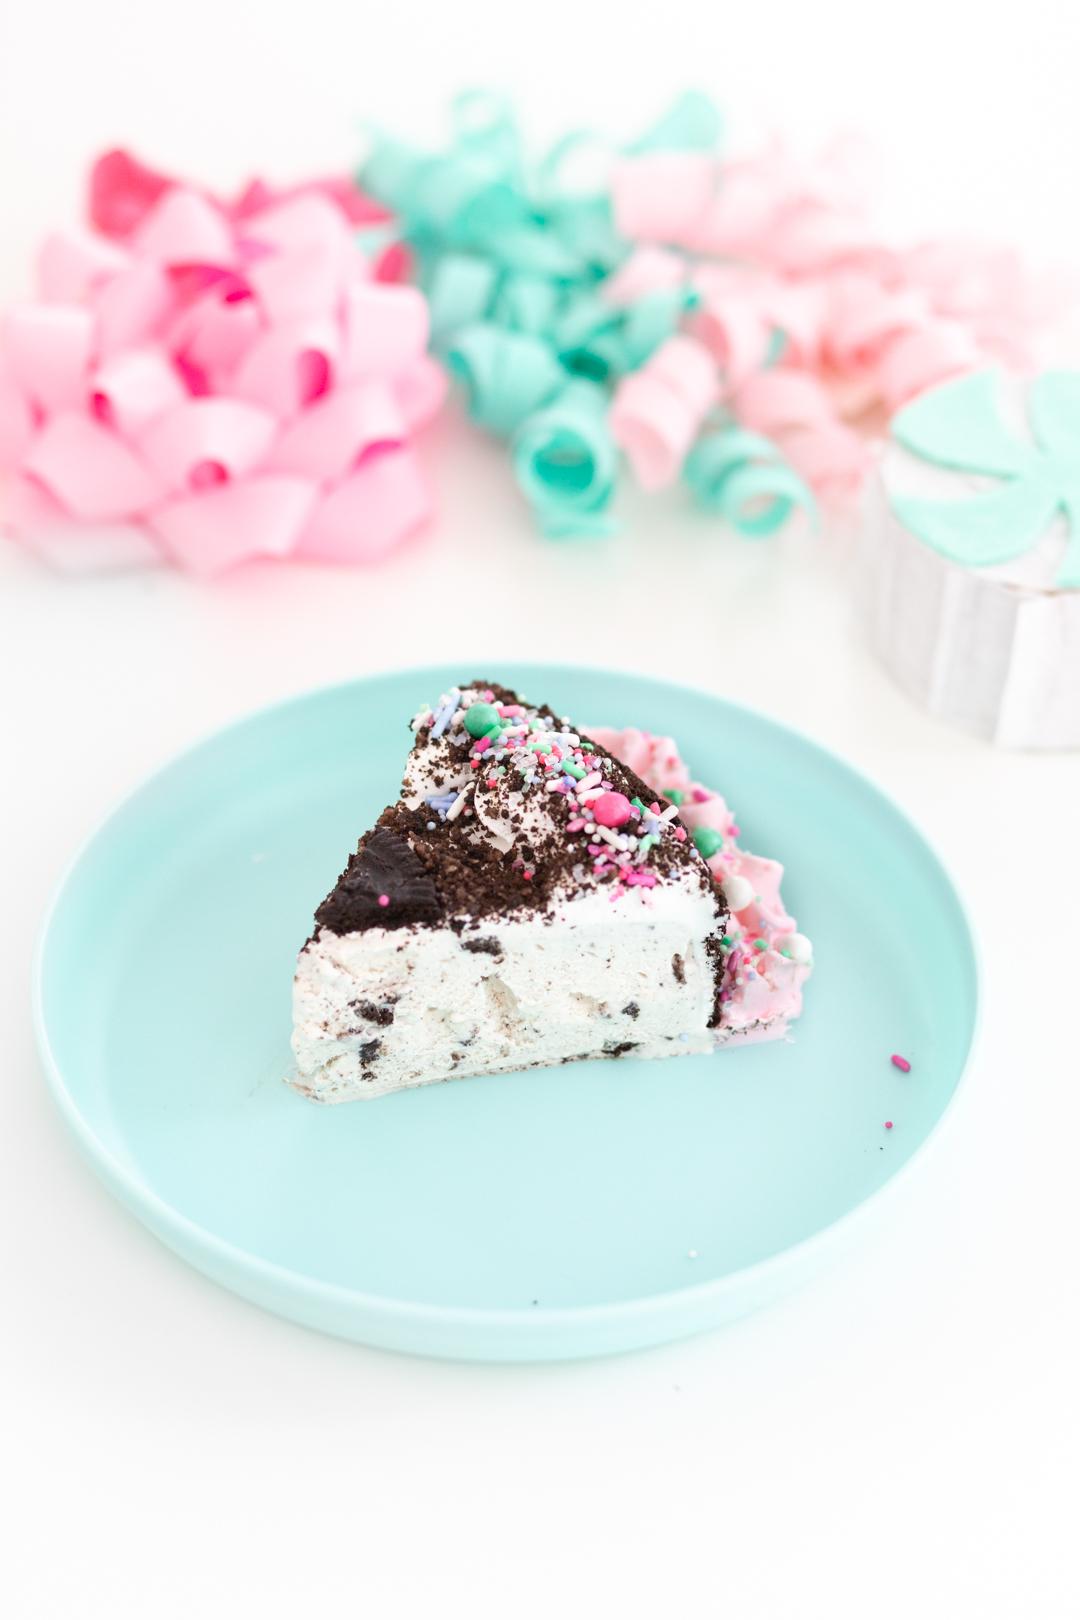 slice of OREO ice cream cake